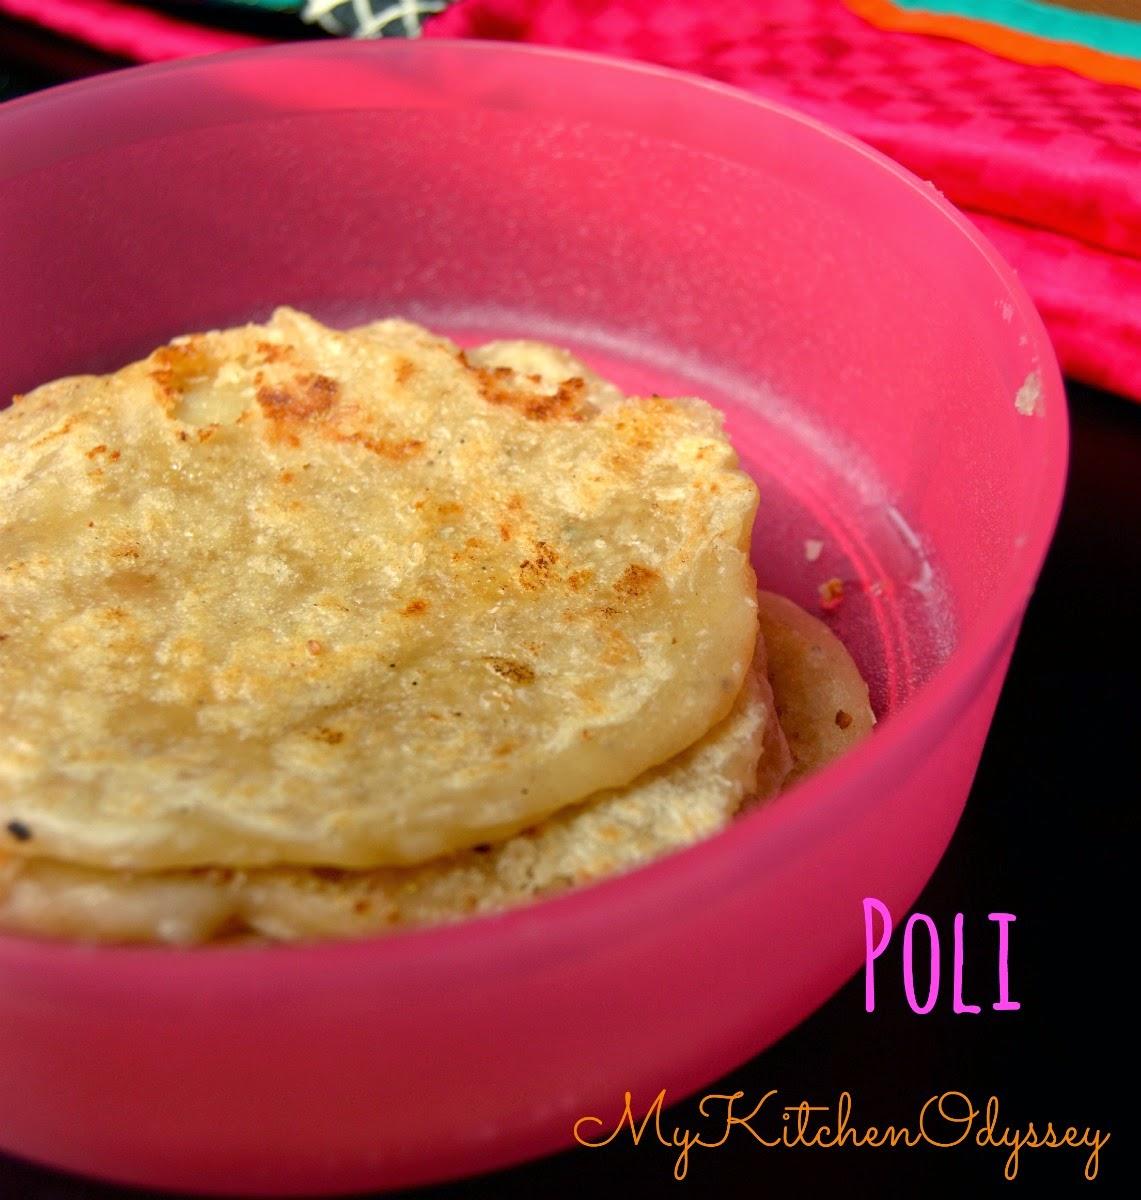 poli recipe